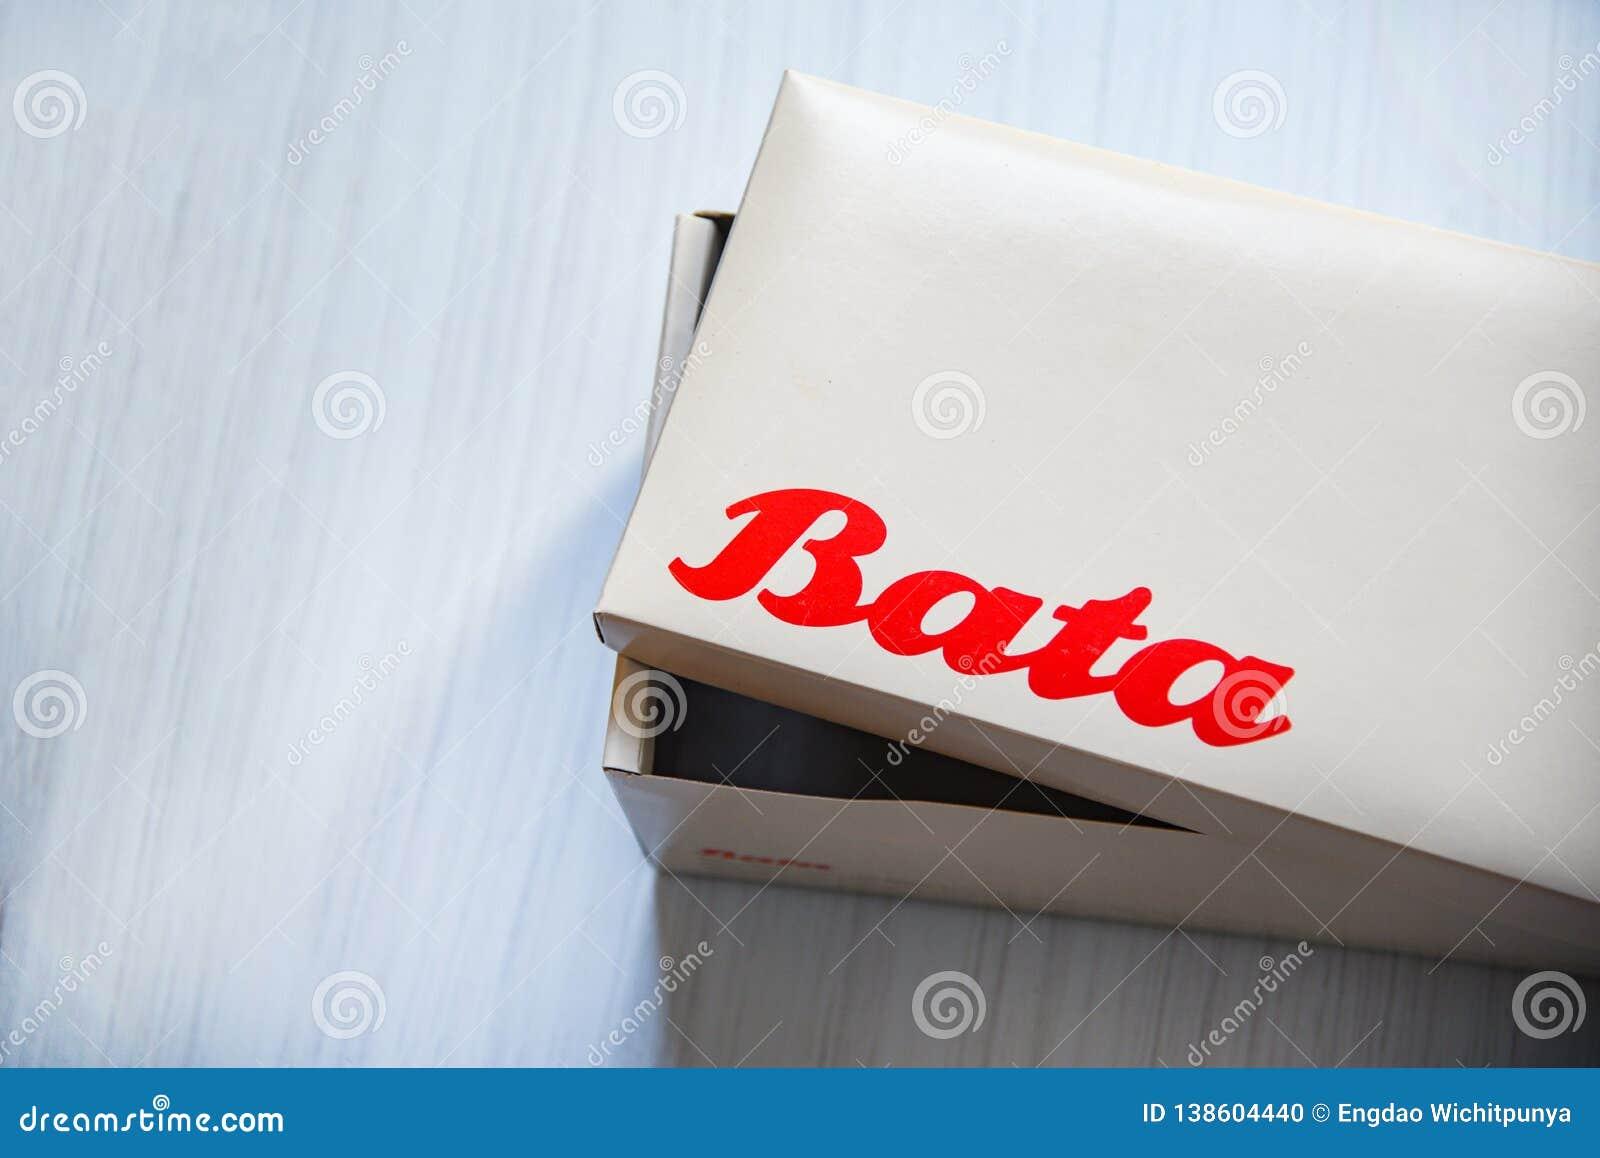 Box shoe Bata logo banner and red wording